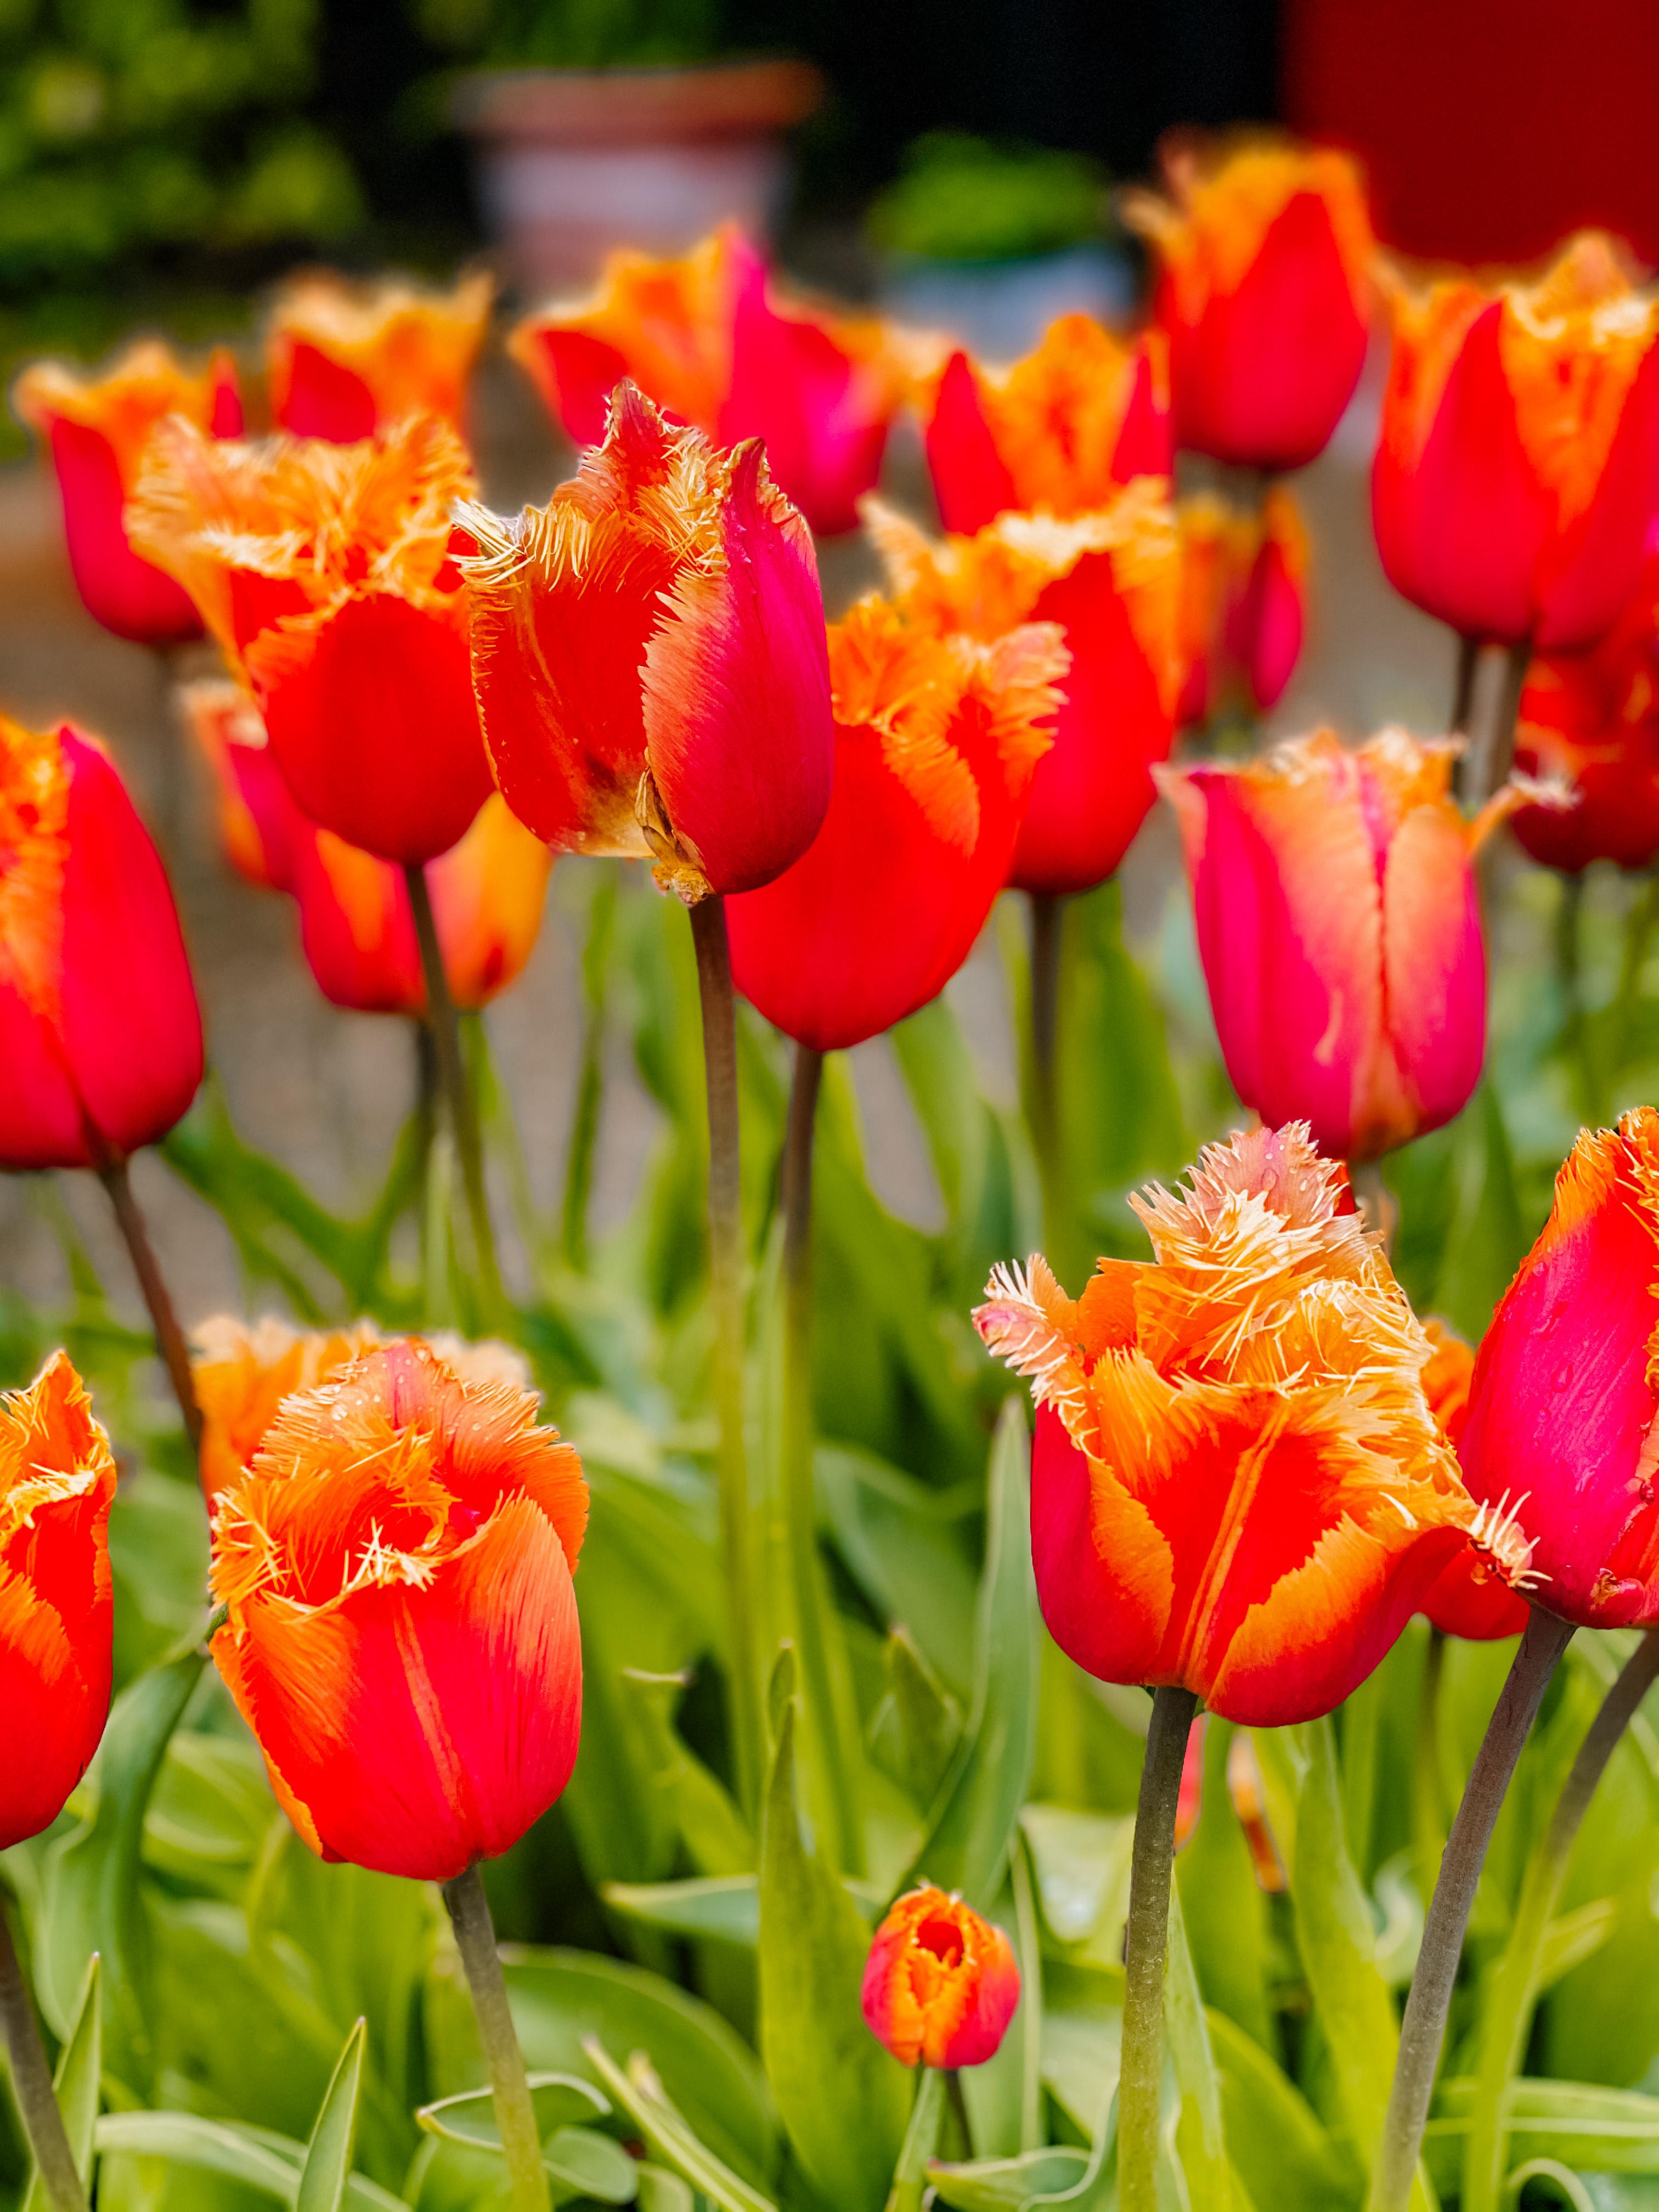 arundel castle tulips